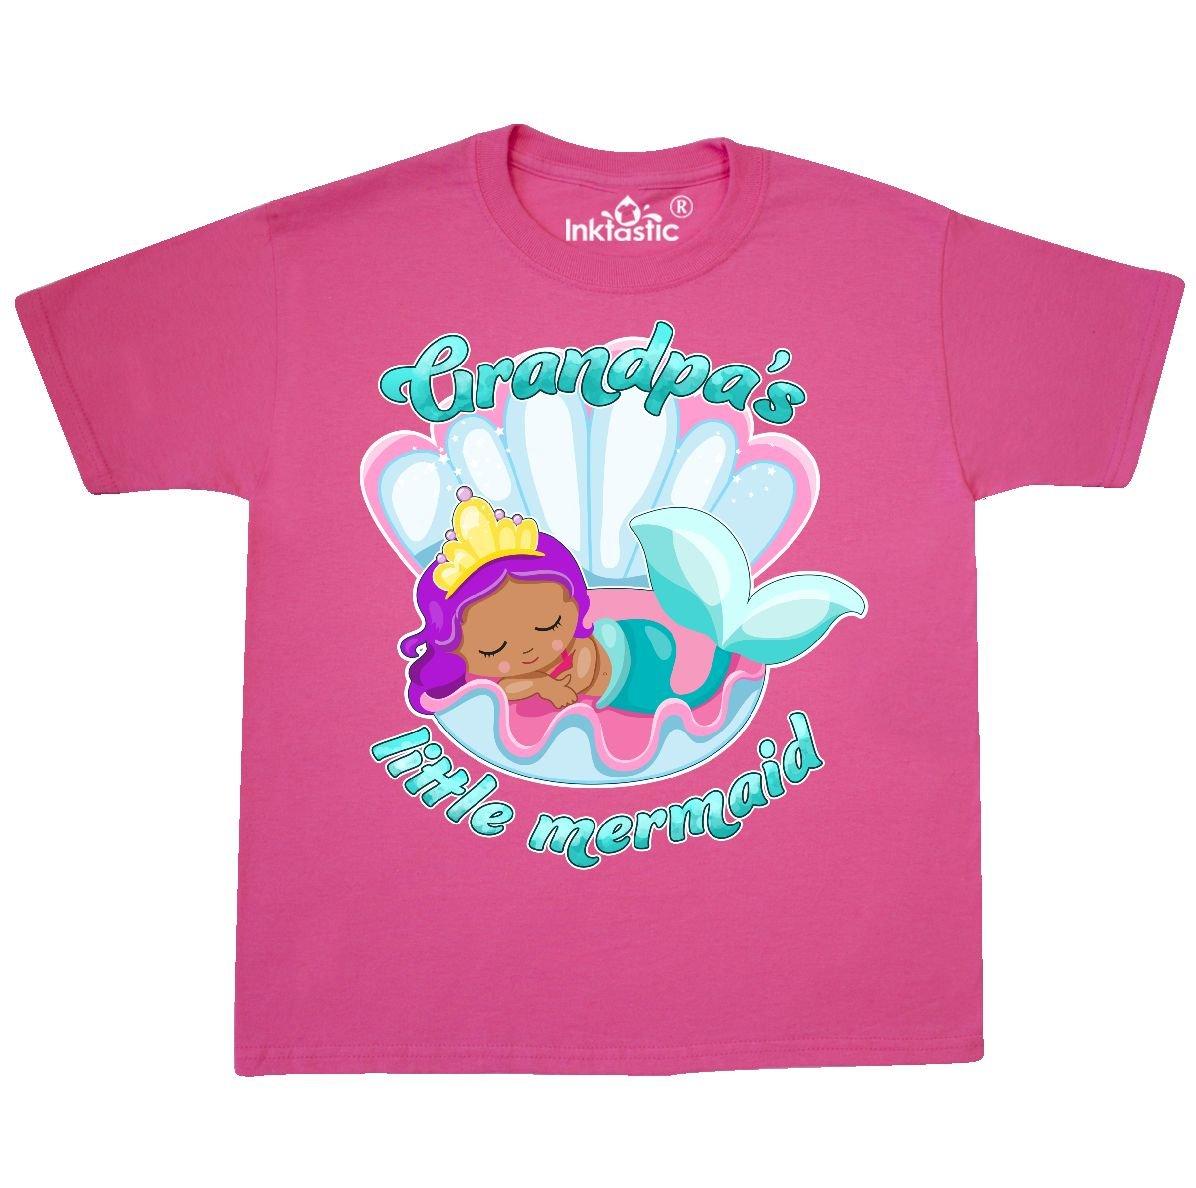 a2f1c7c0bea87 Amazon.com: inktastic Grandpa's Little Mermaid Youth T-Shirt: Clothing